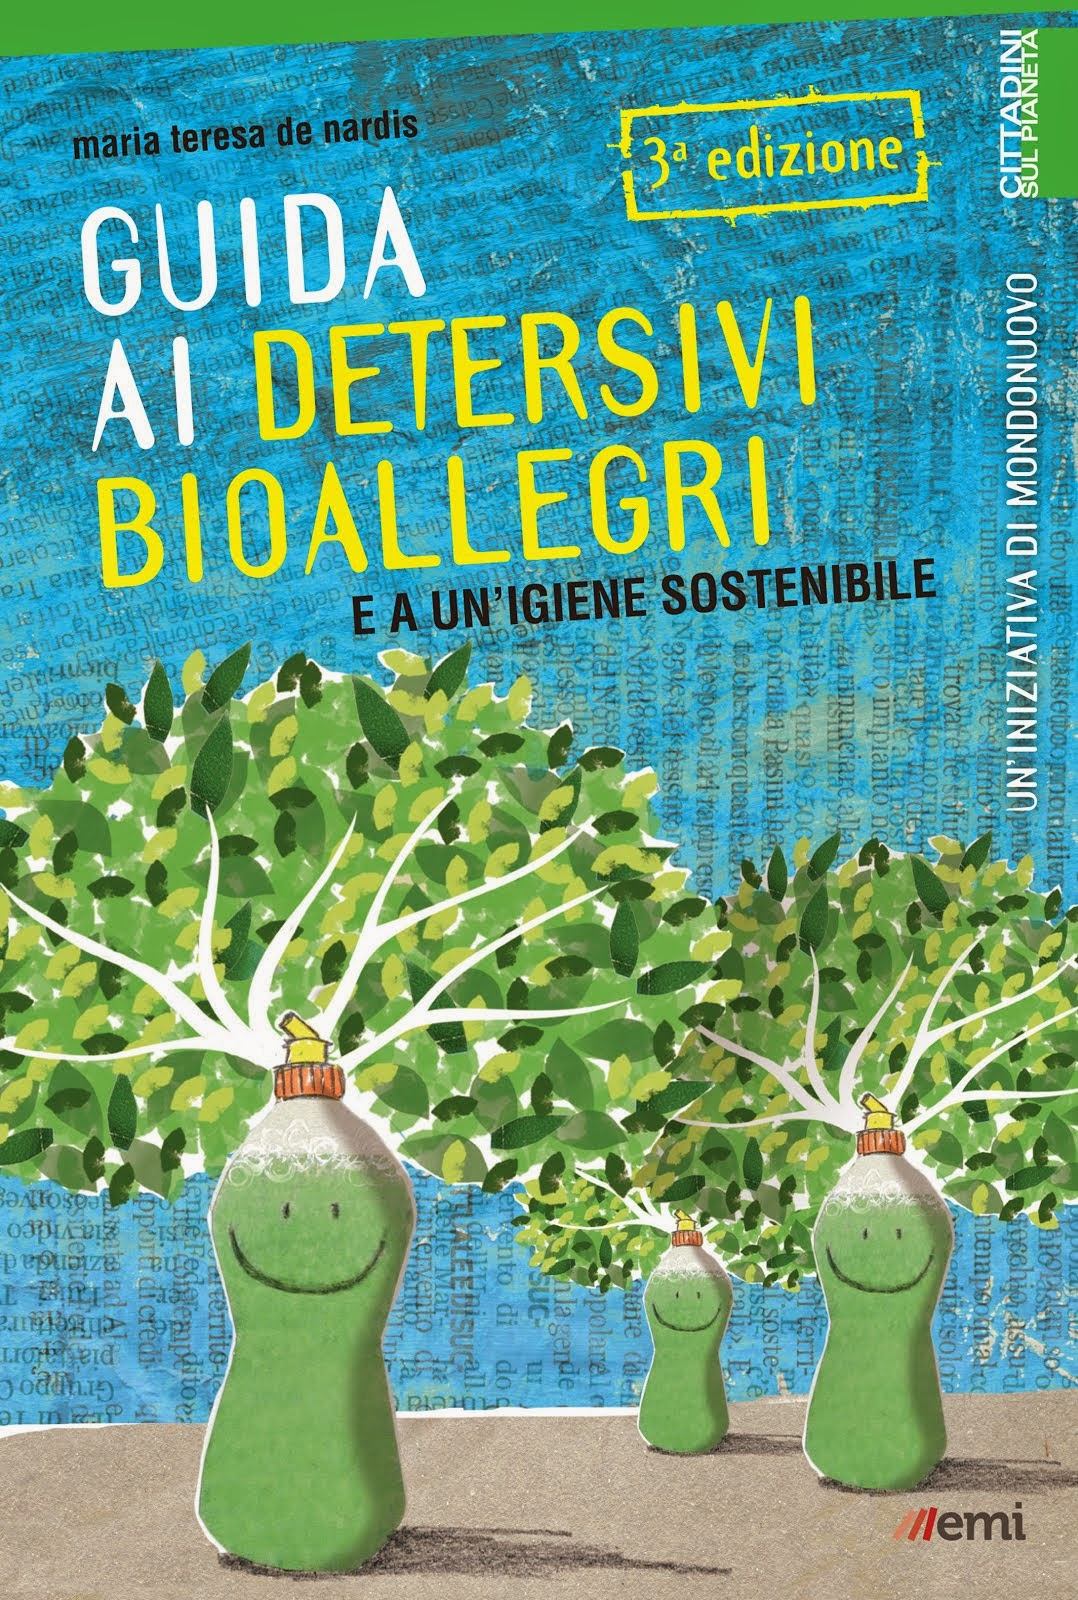 Guida ai detersivi bioallegri e a un'igiene sostenibile – De Nardis